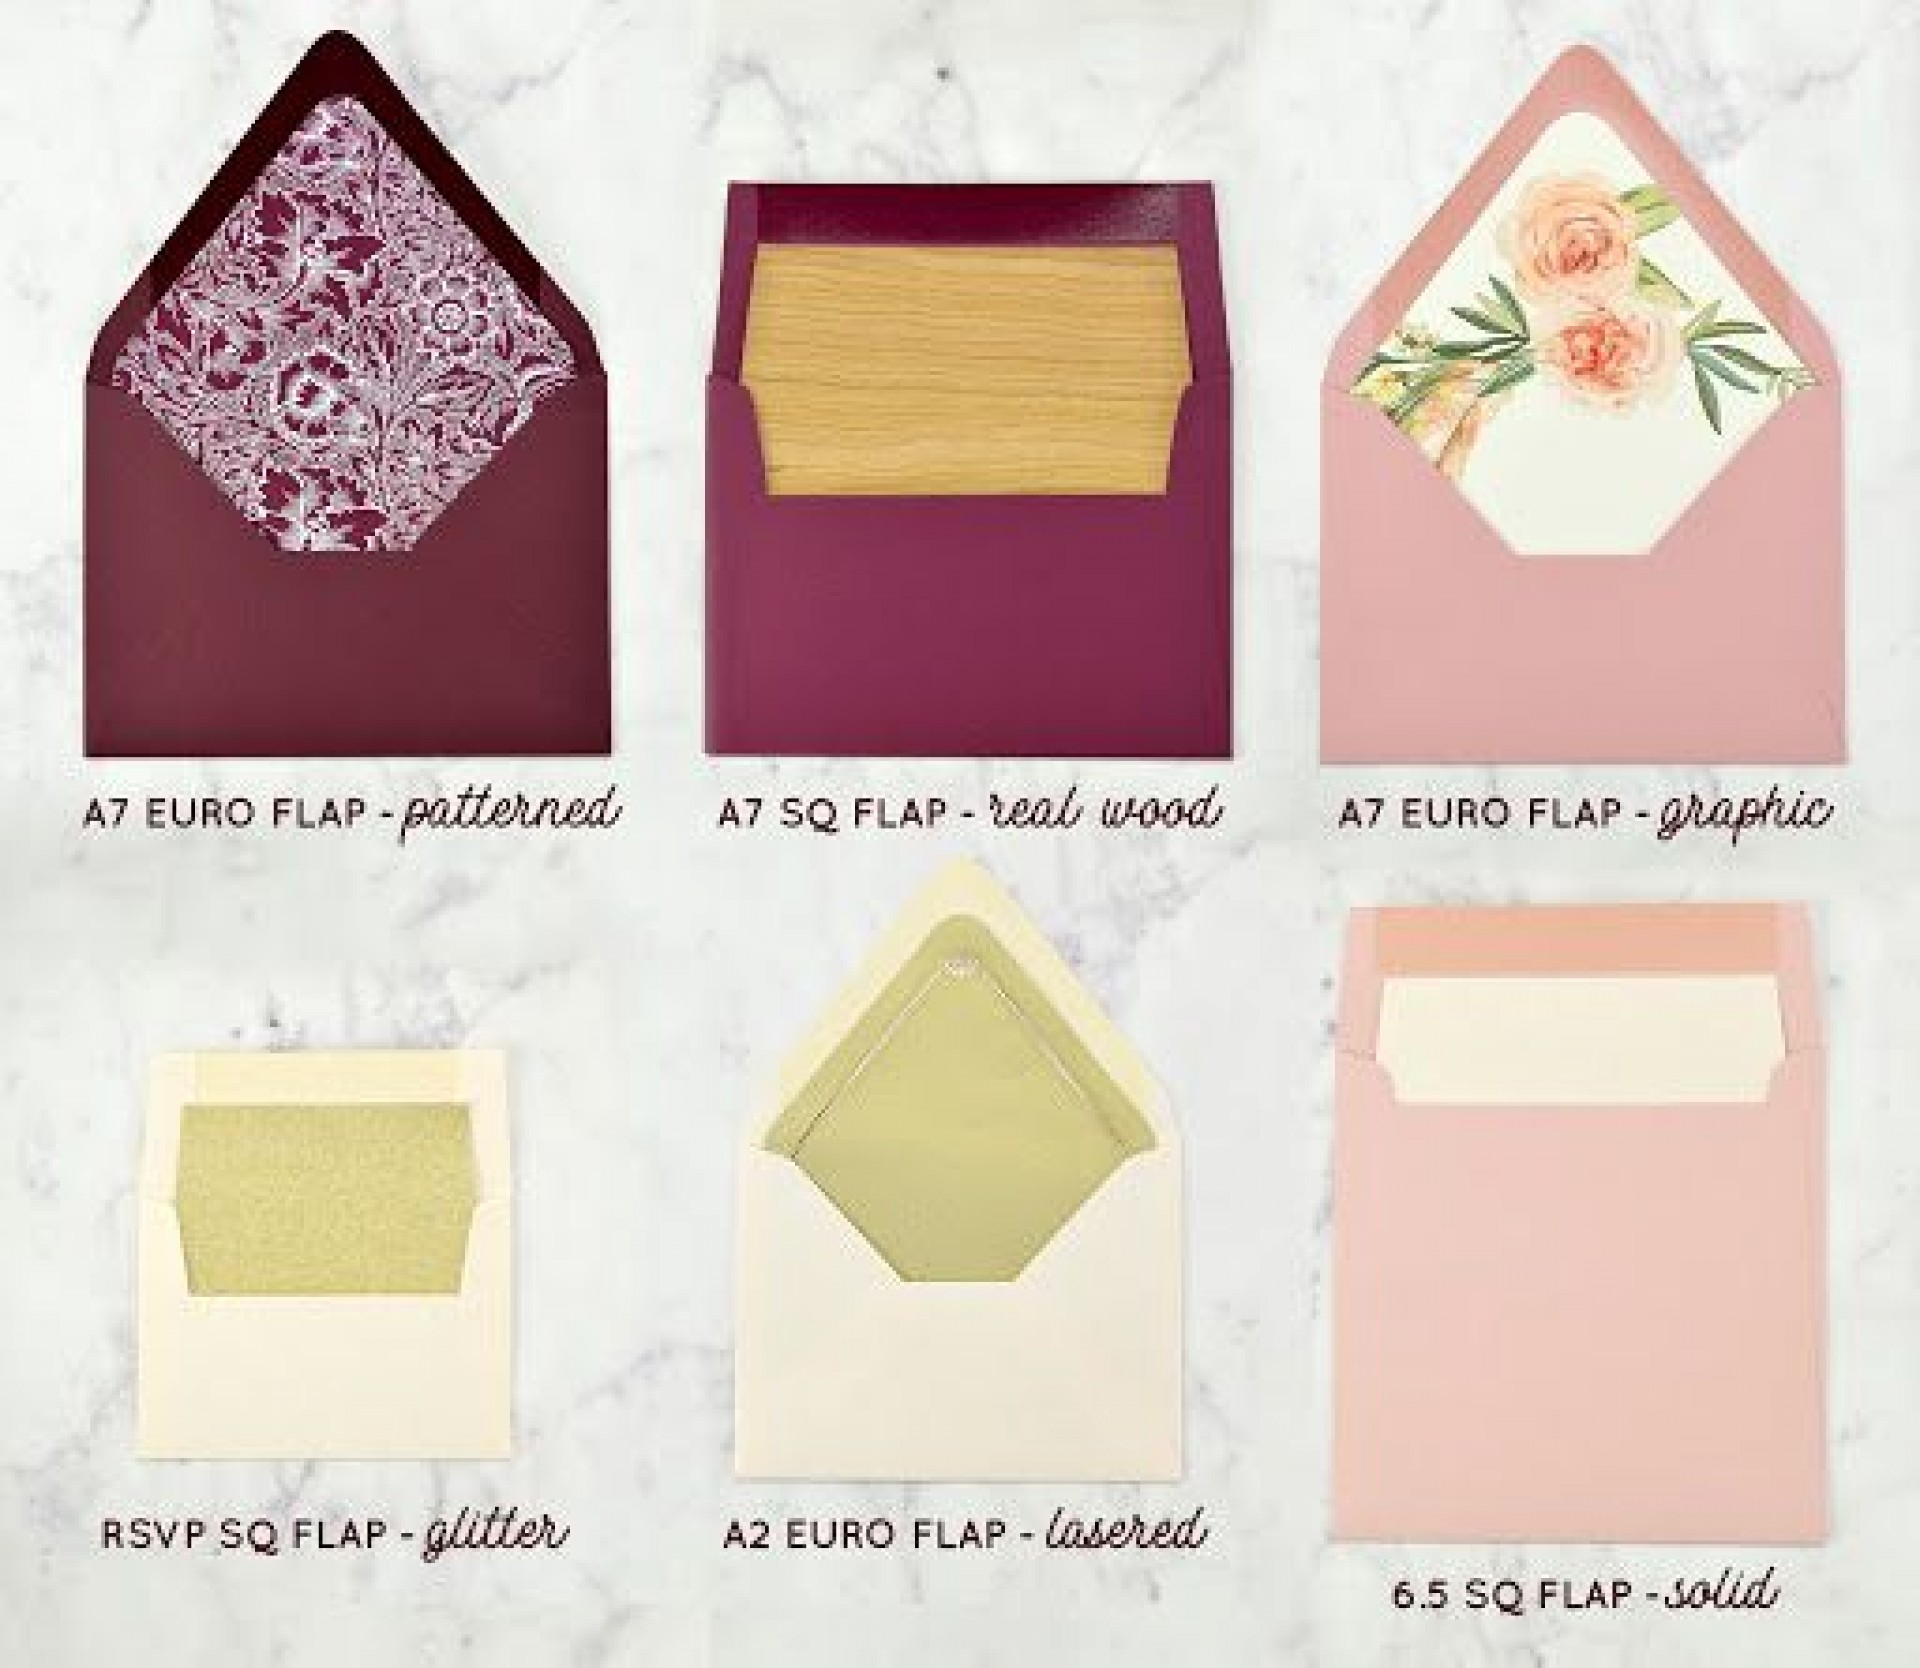 009 Magnificent A7 Square Flap Envelope Liner Template Sample 1920